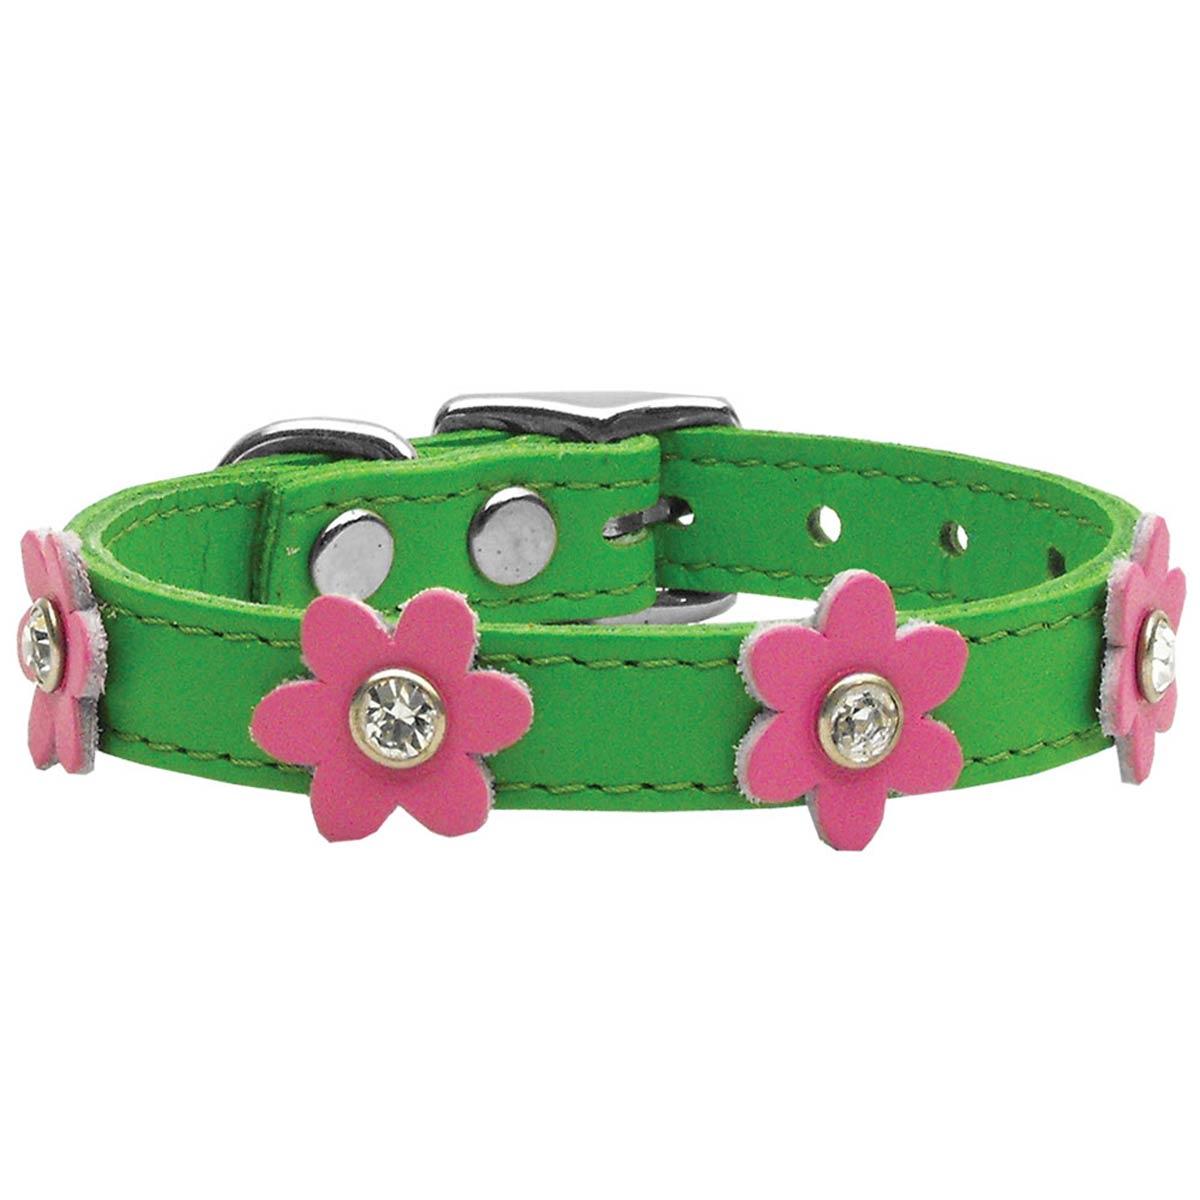 Flower Emerald Green Leather Dog Collar Pin Baxterboo